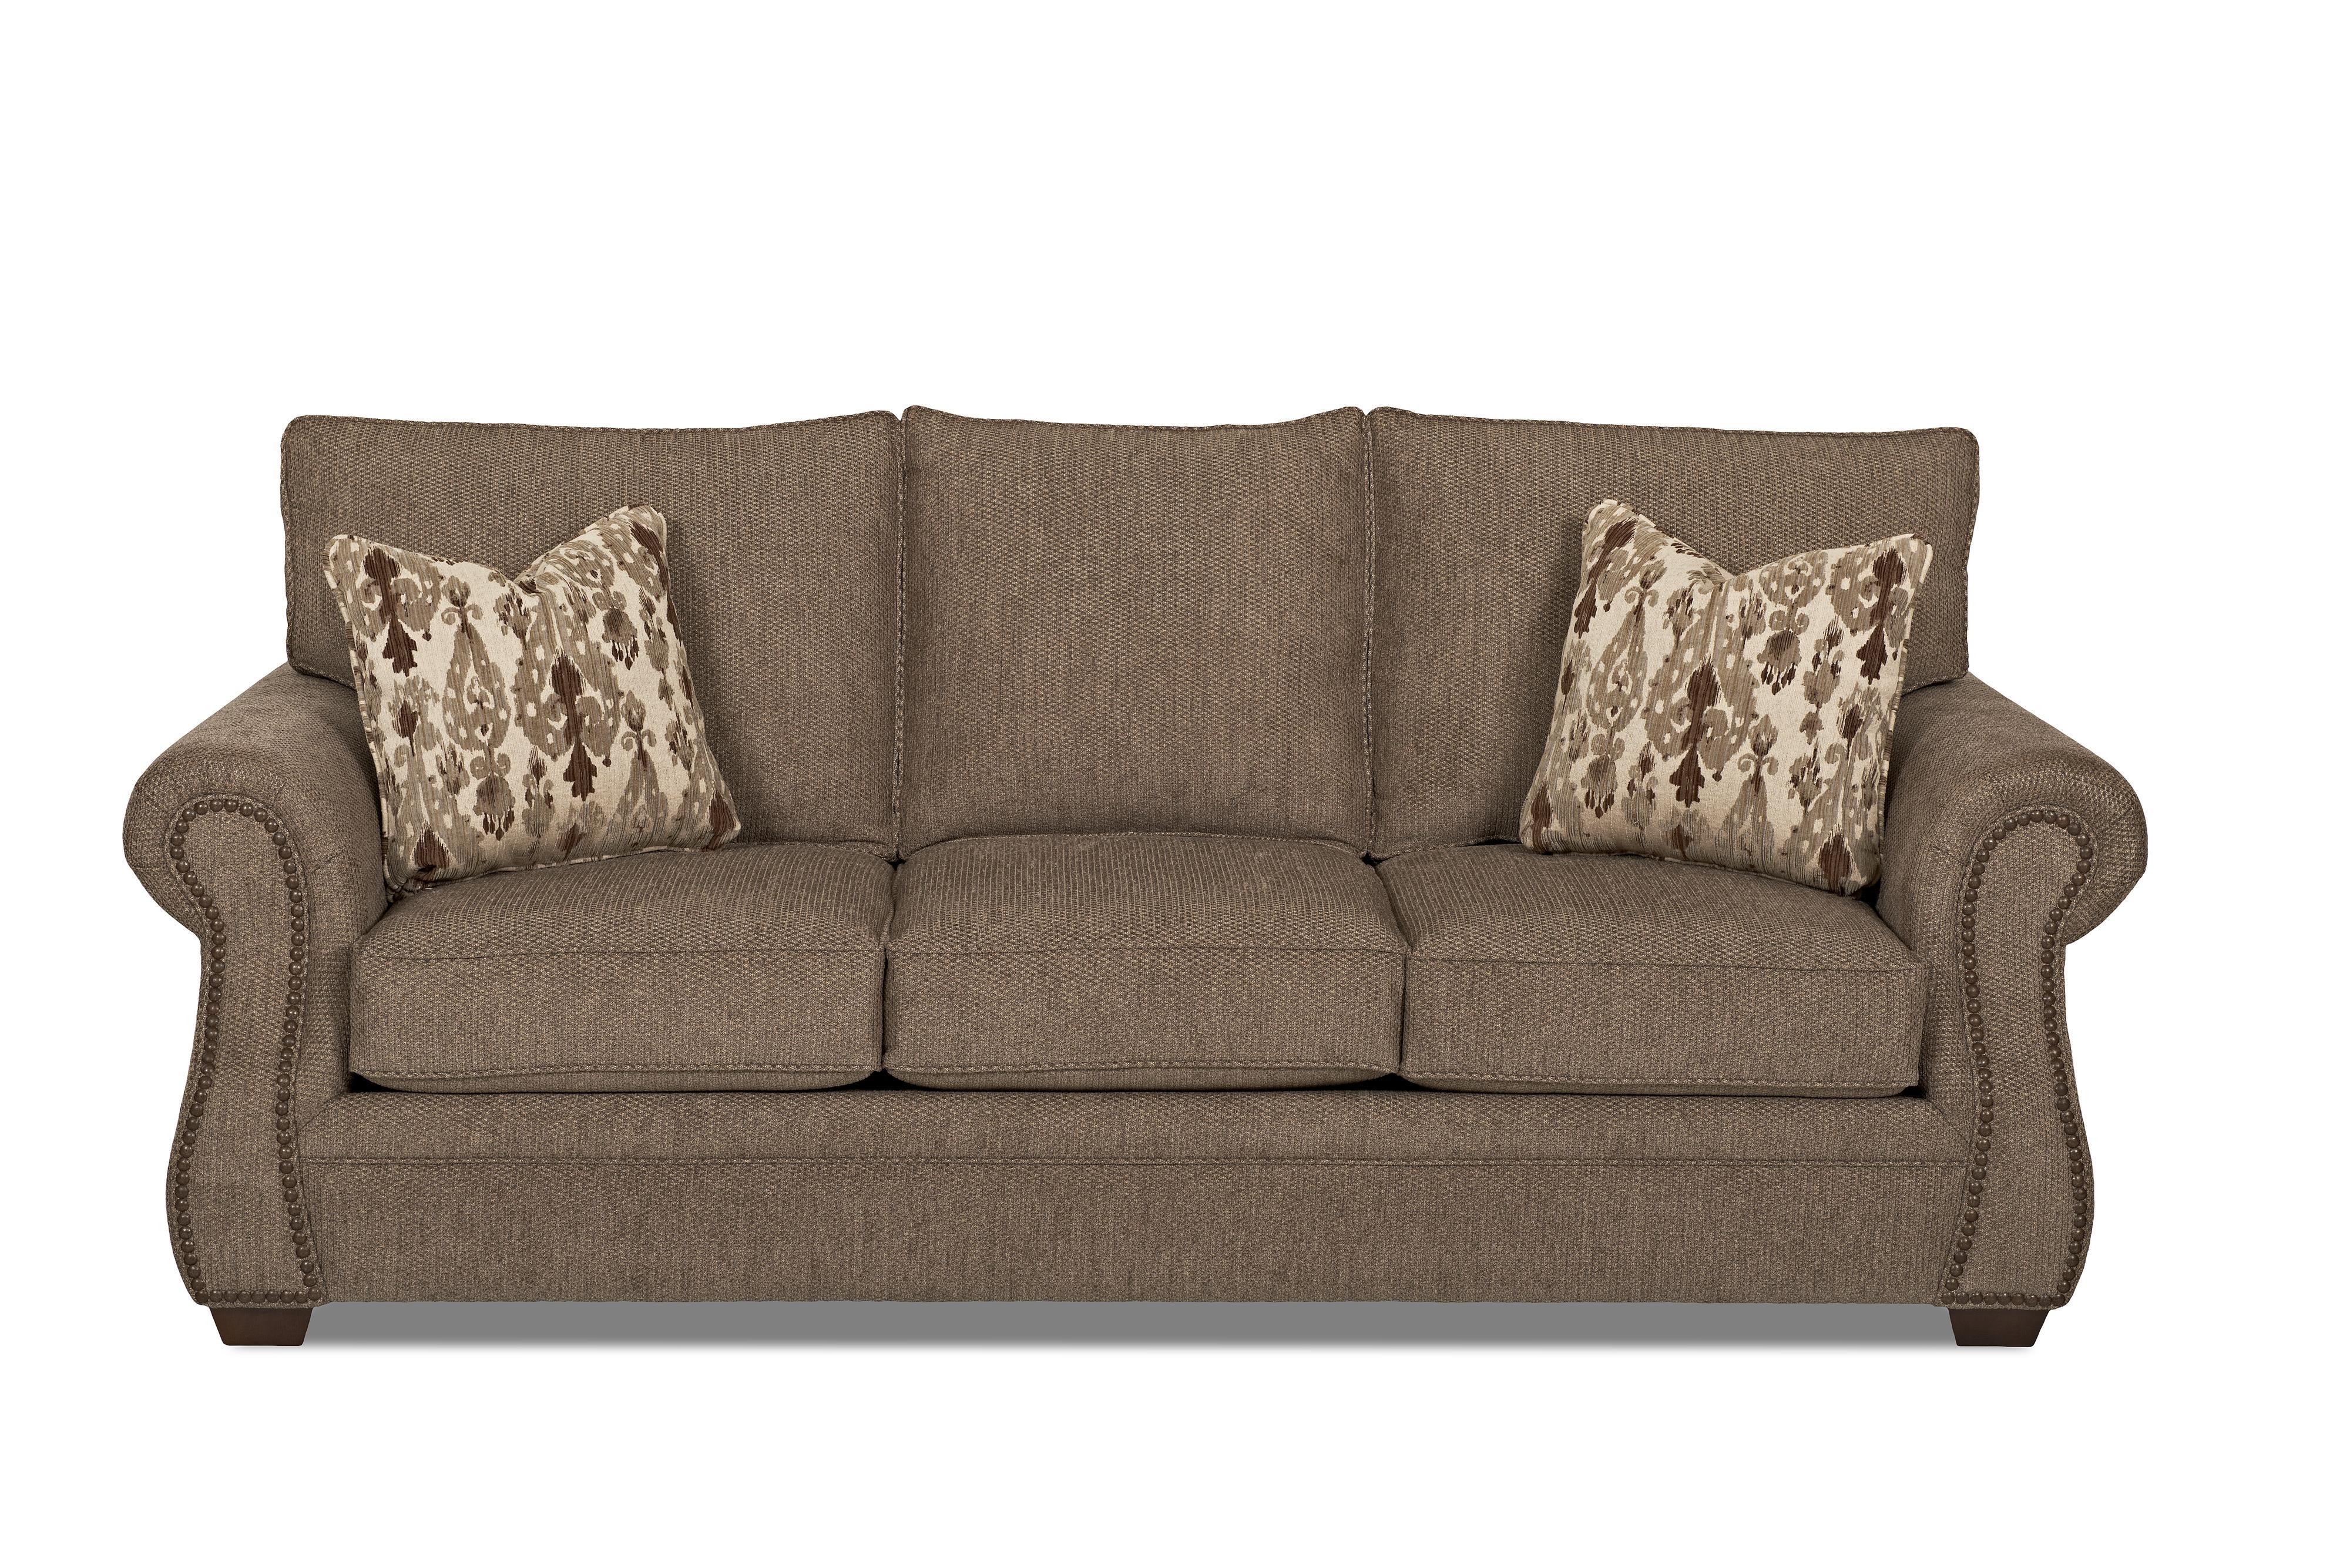 Klaussner Jasper Traditional Sofa with Nailhead Trim Dunk